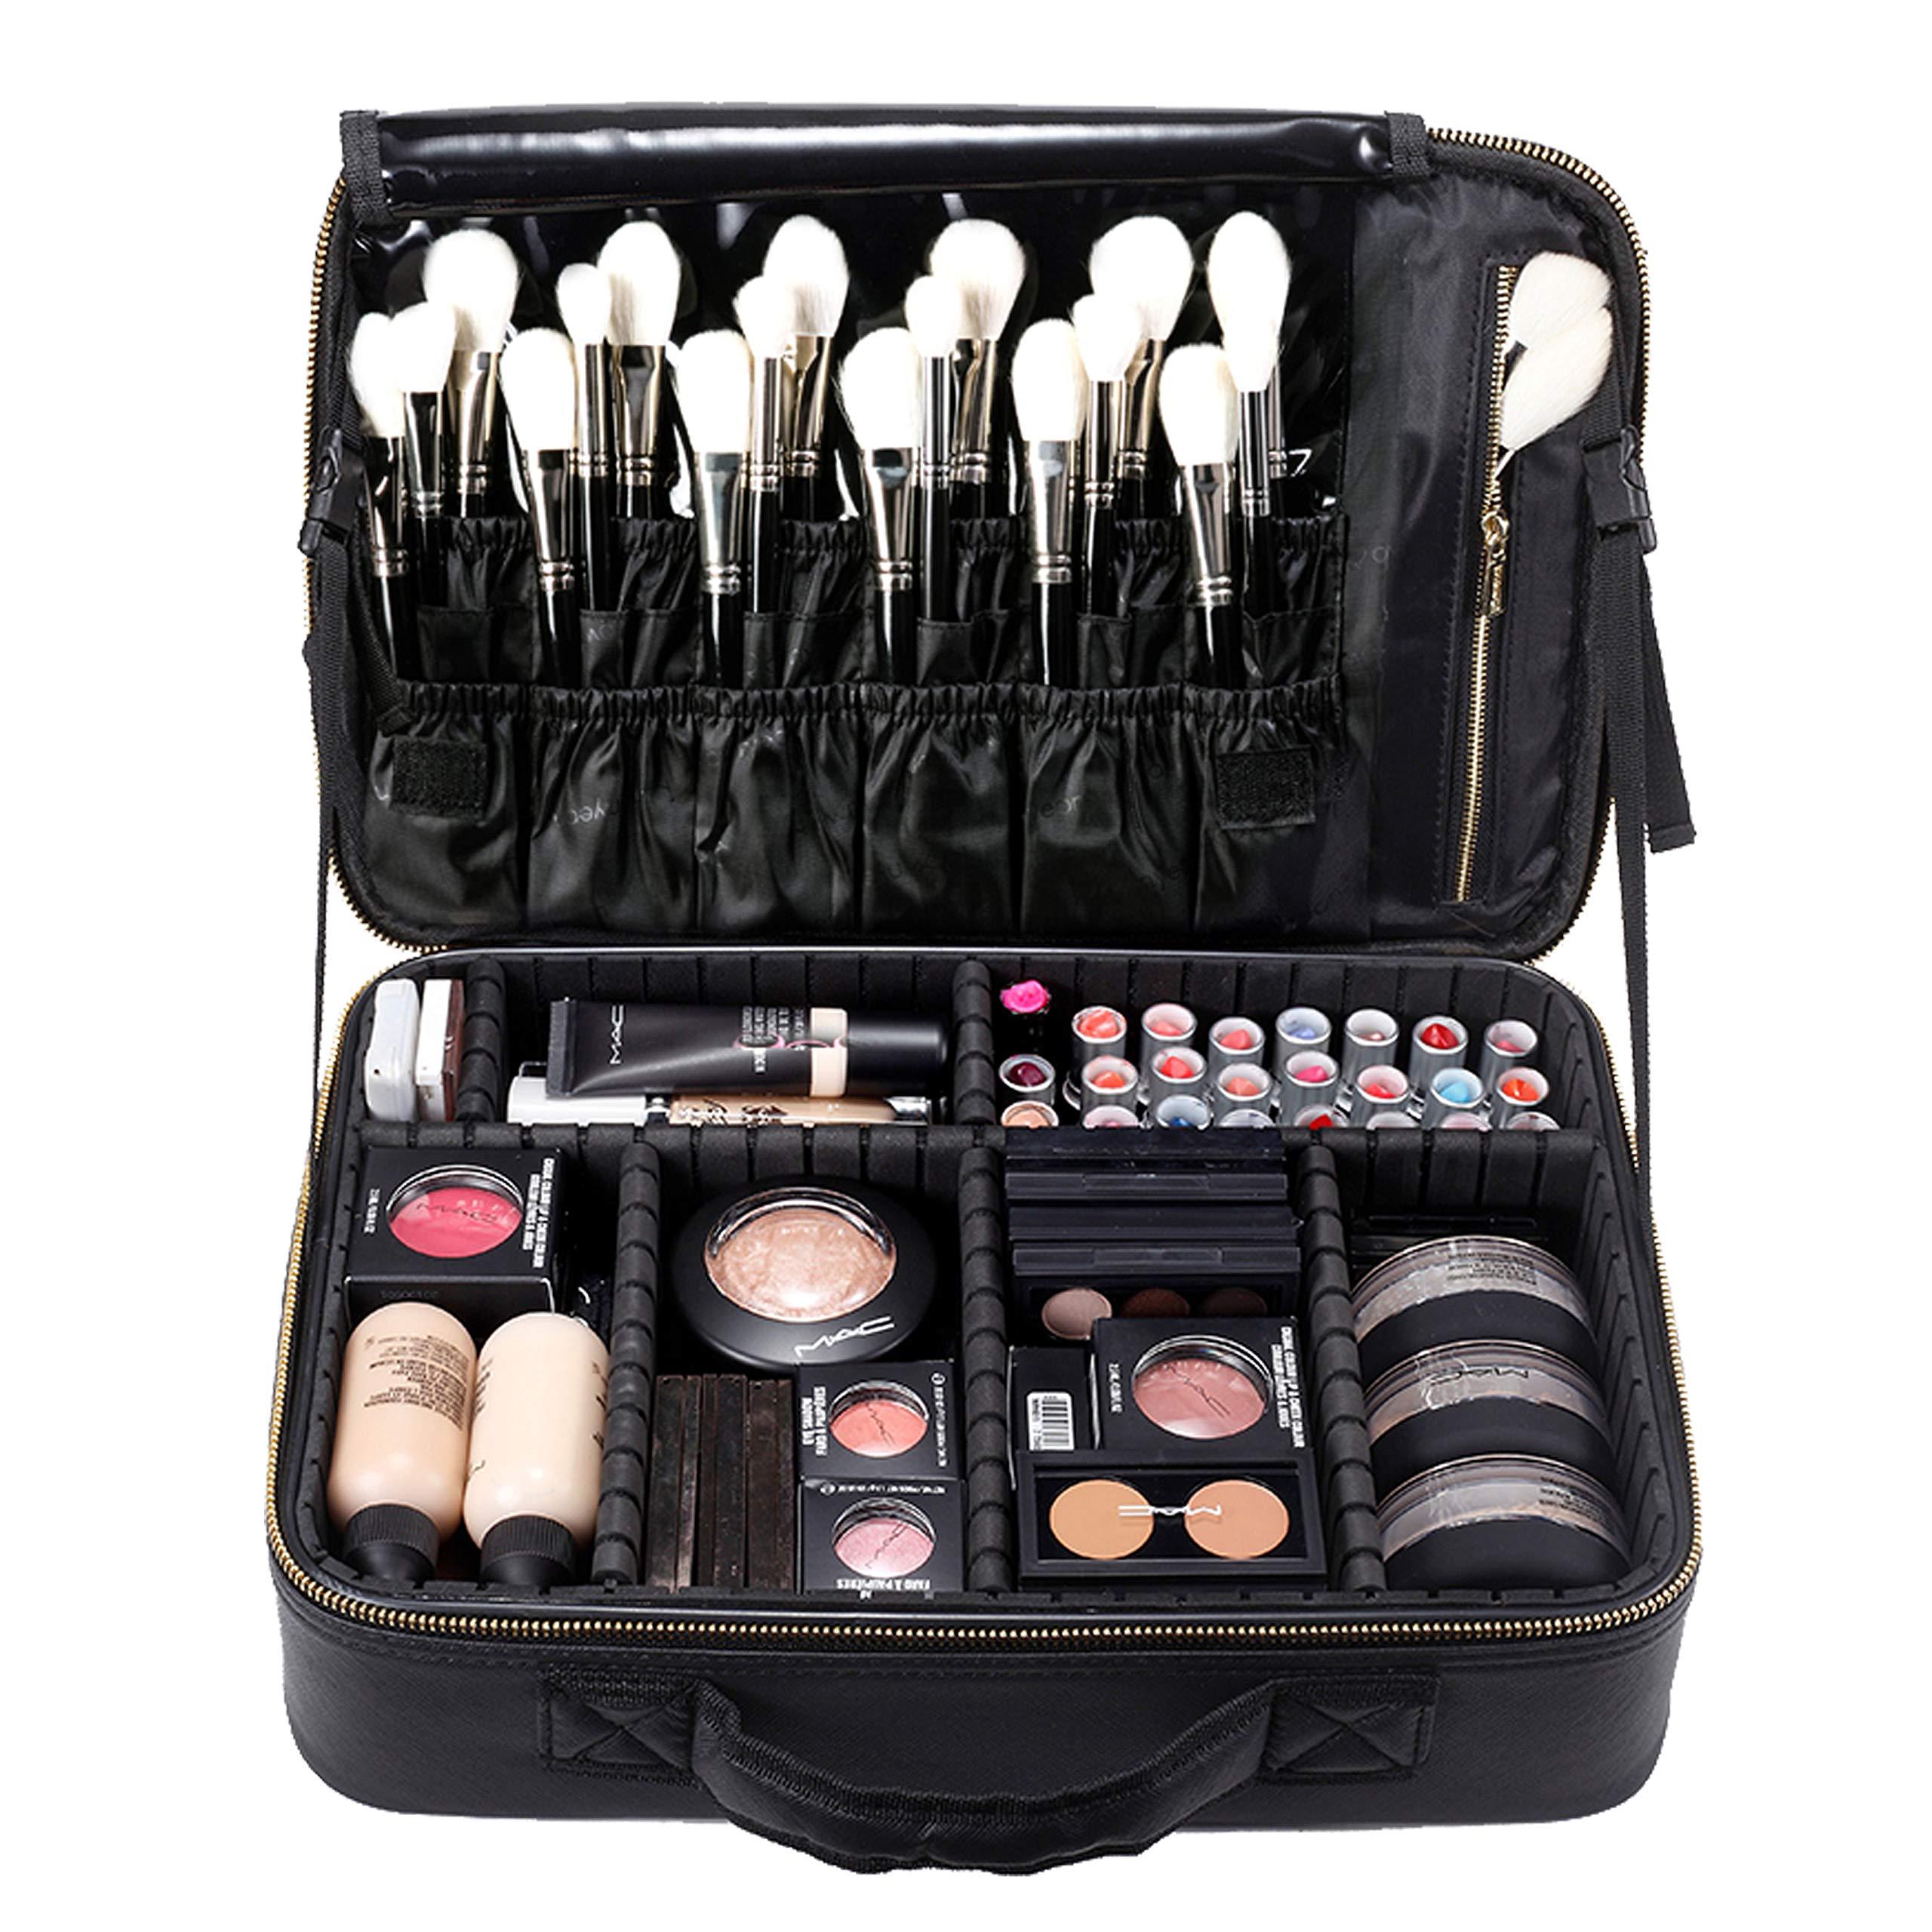 ROWNYEON Makeup Bag Makeup Case Cosmetic EVA Makeup Organizer Bag Portable Case Professional Makeup Artist Bag(Large Black) by ROWNYEON